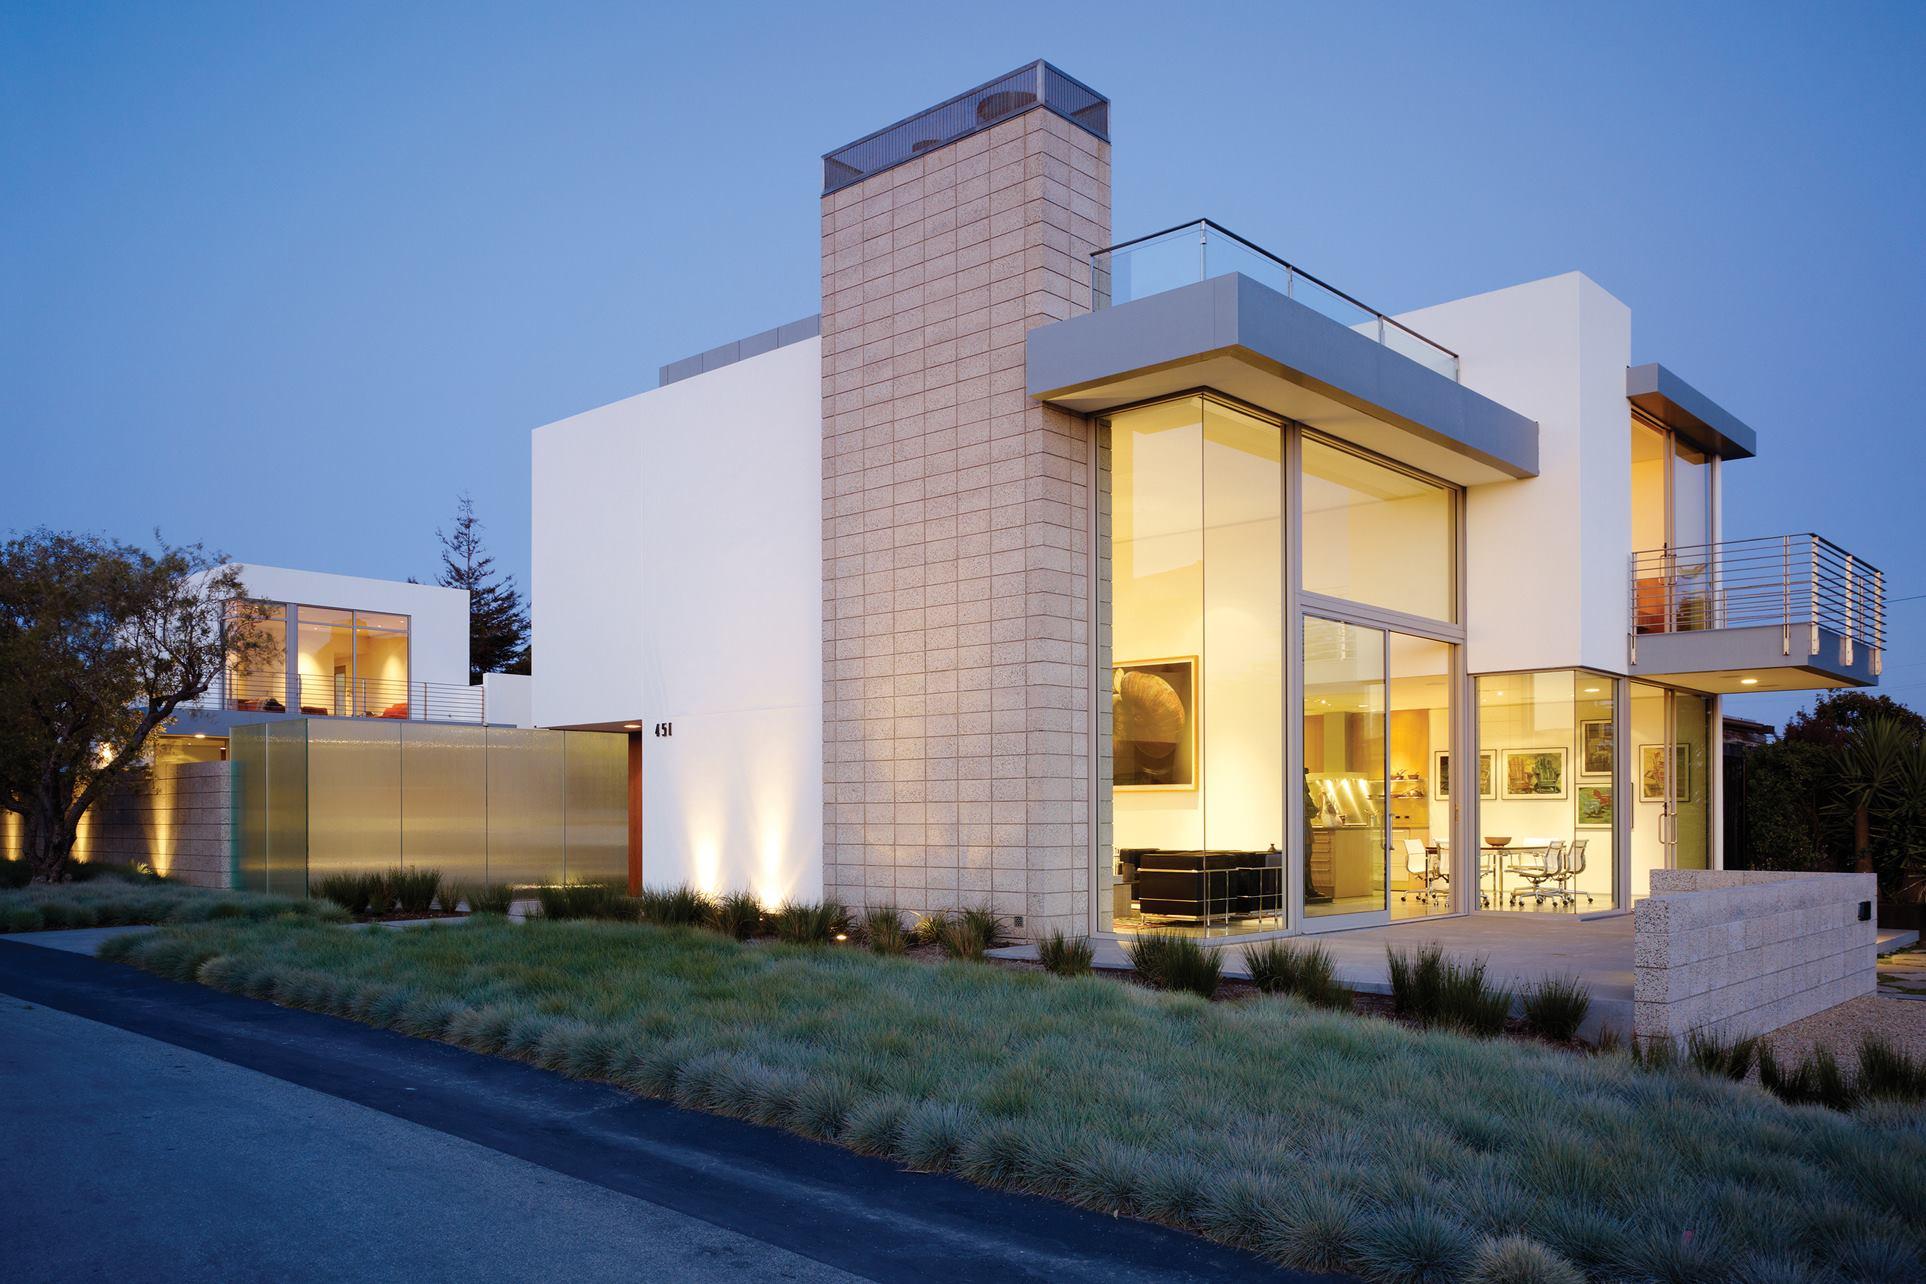 Zeidler residence aptos calif custom home magazine - Limposante residence contemporaine de ehrlich architects ...